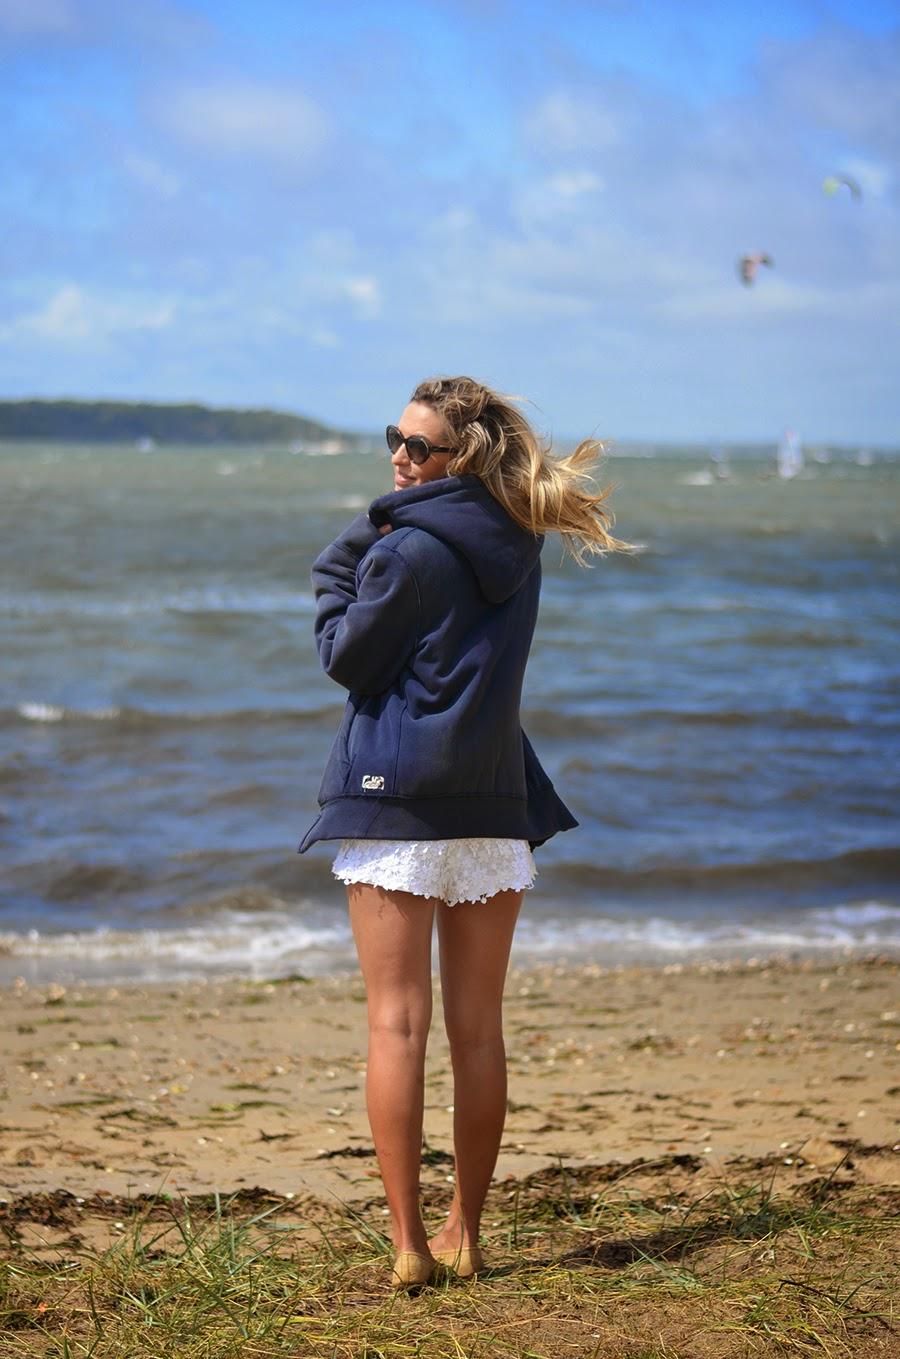 sanbanks, england, uk, travel, beach in the uk